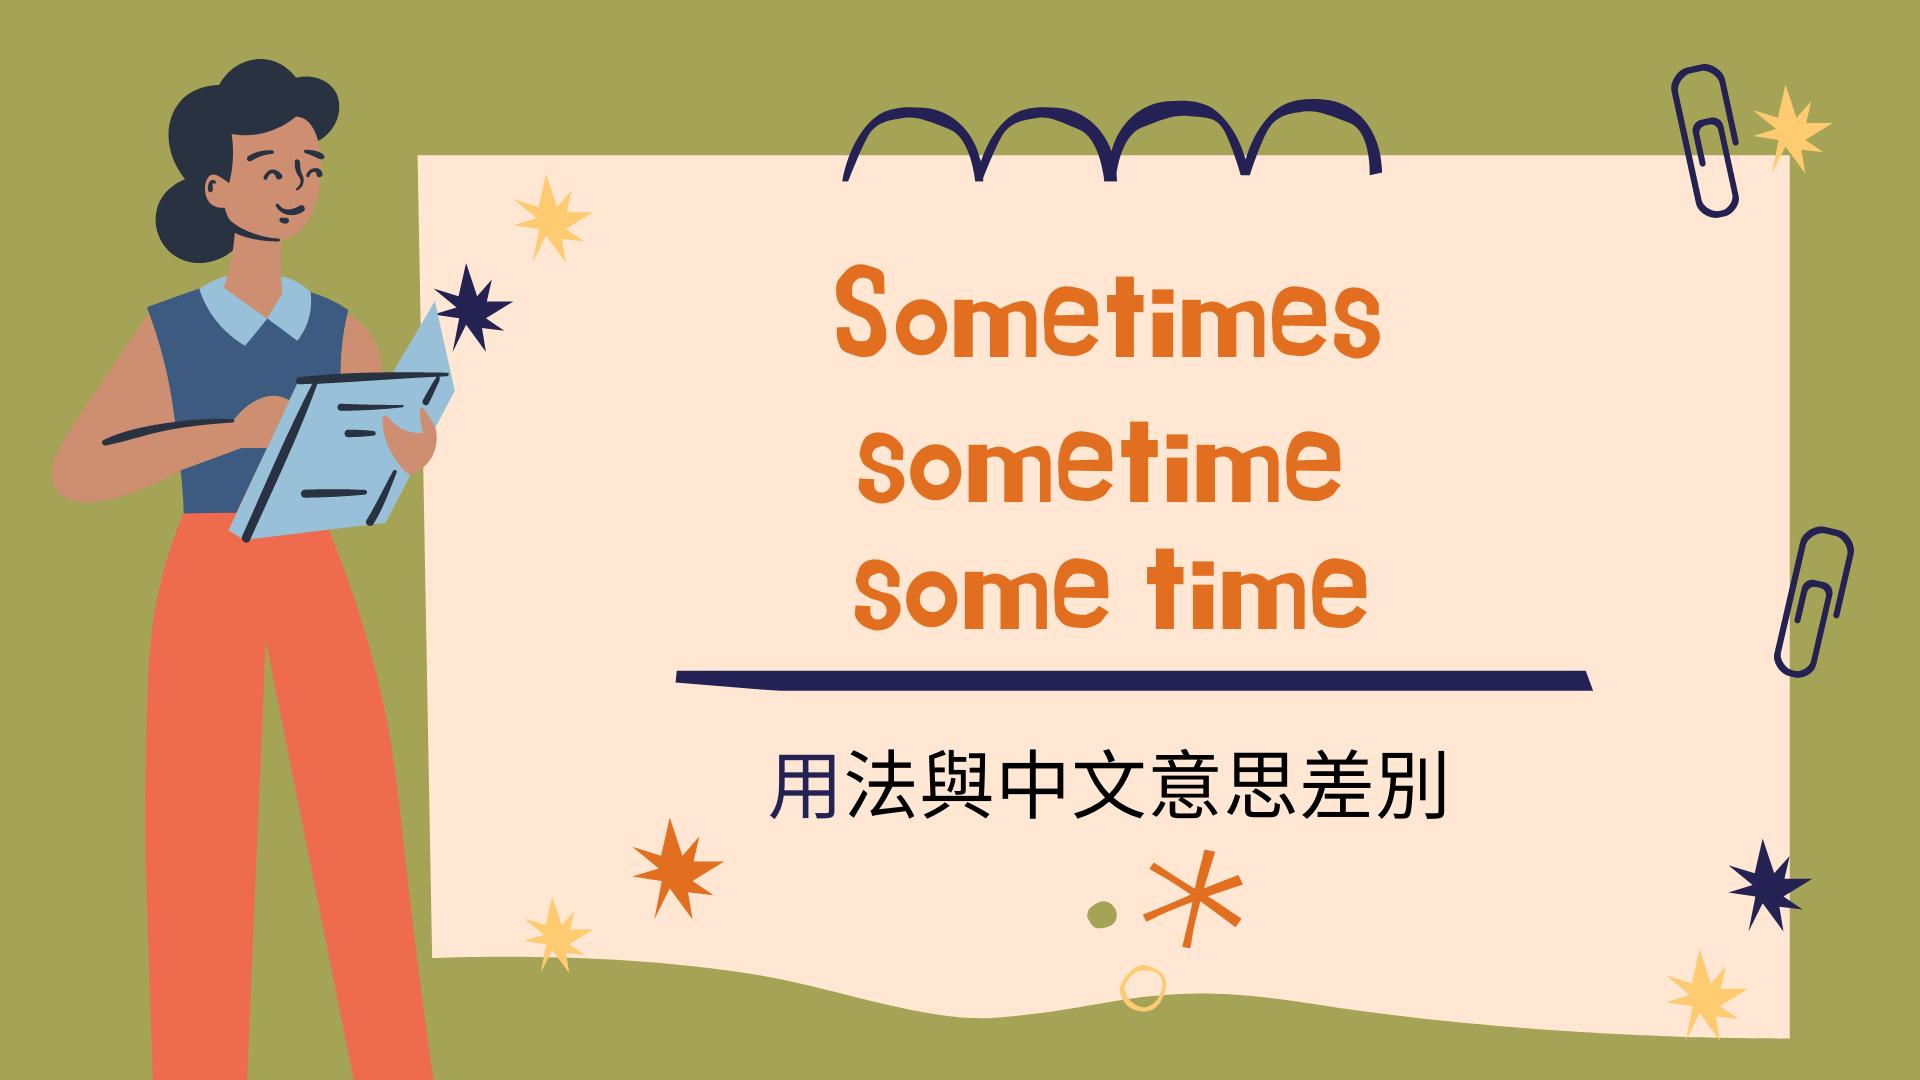 英文 Sometimes/ sometime/ some time 用法與中文意思差別!